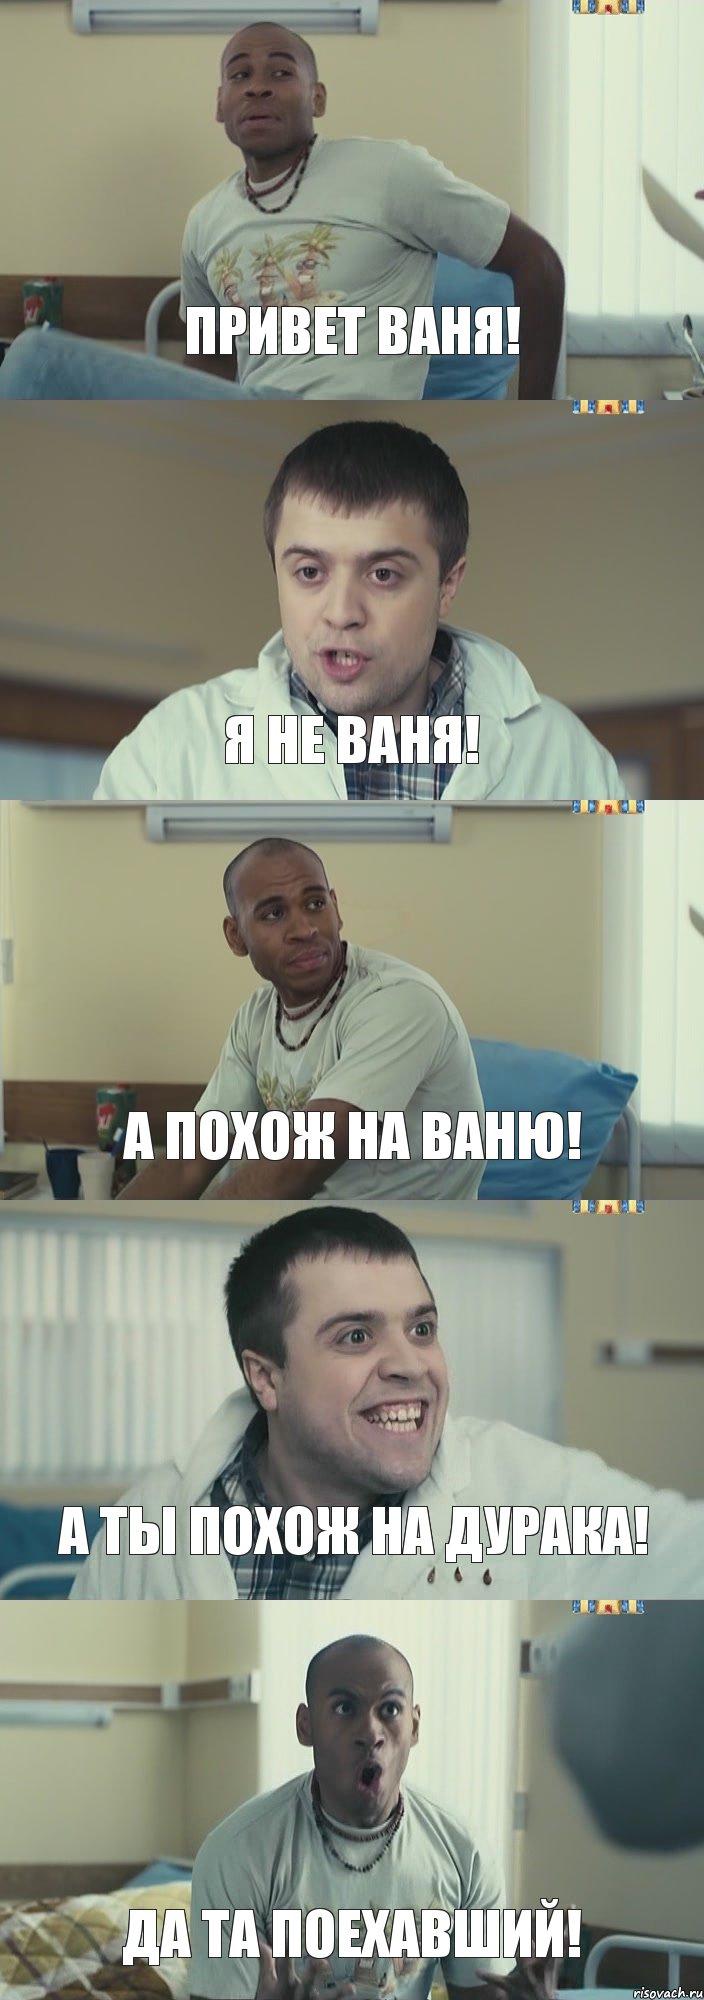 samaya-krasivaya-devushka-permi